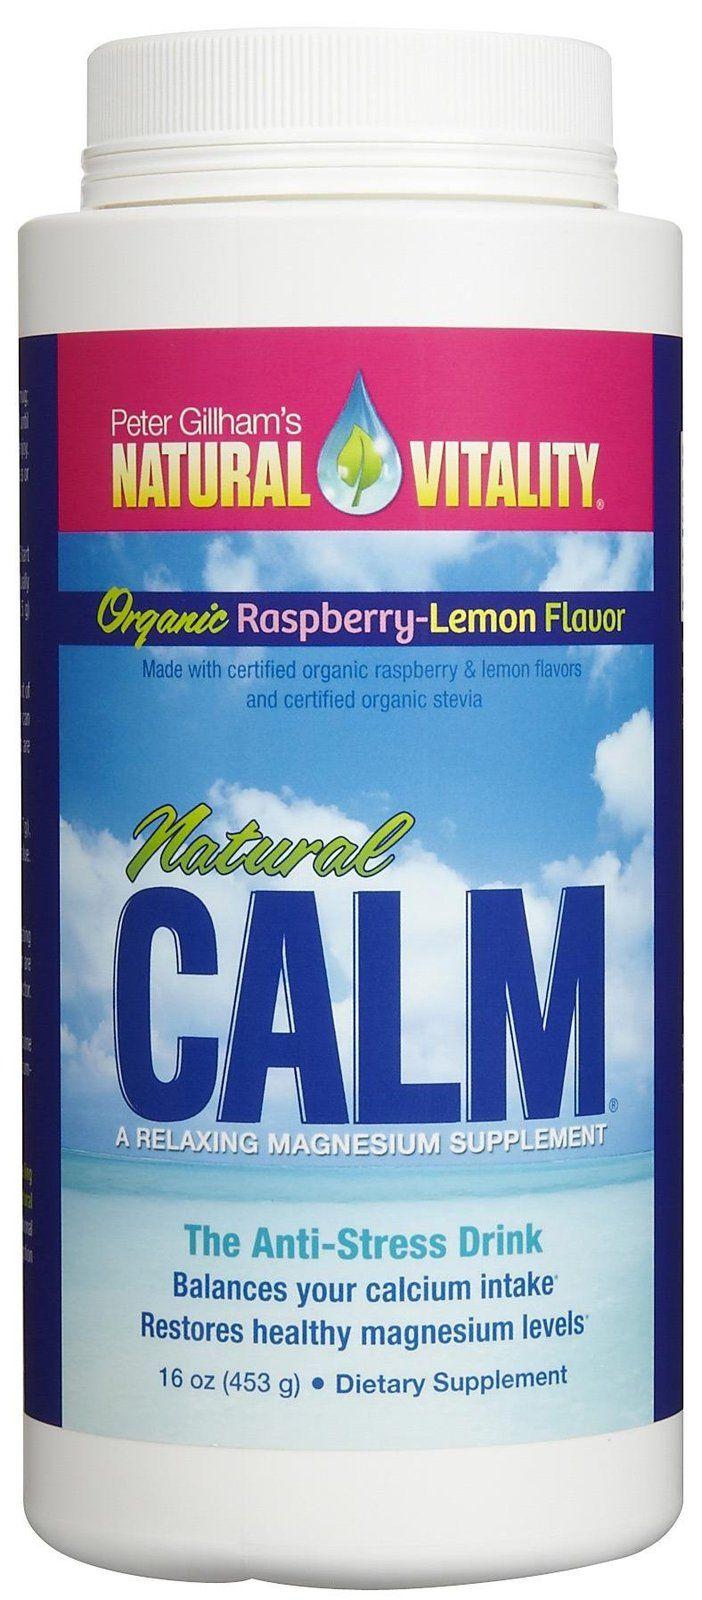 I LOVE this stuff Natural Vitality Natural Calm